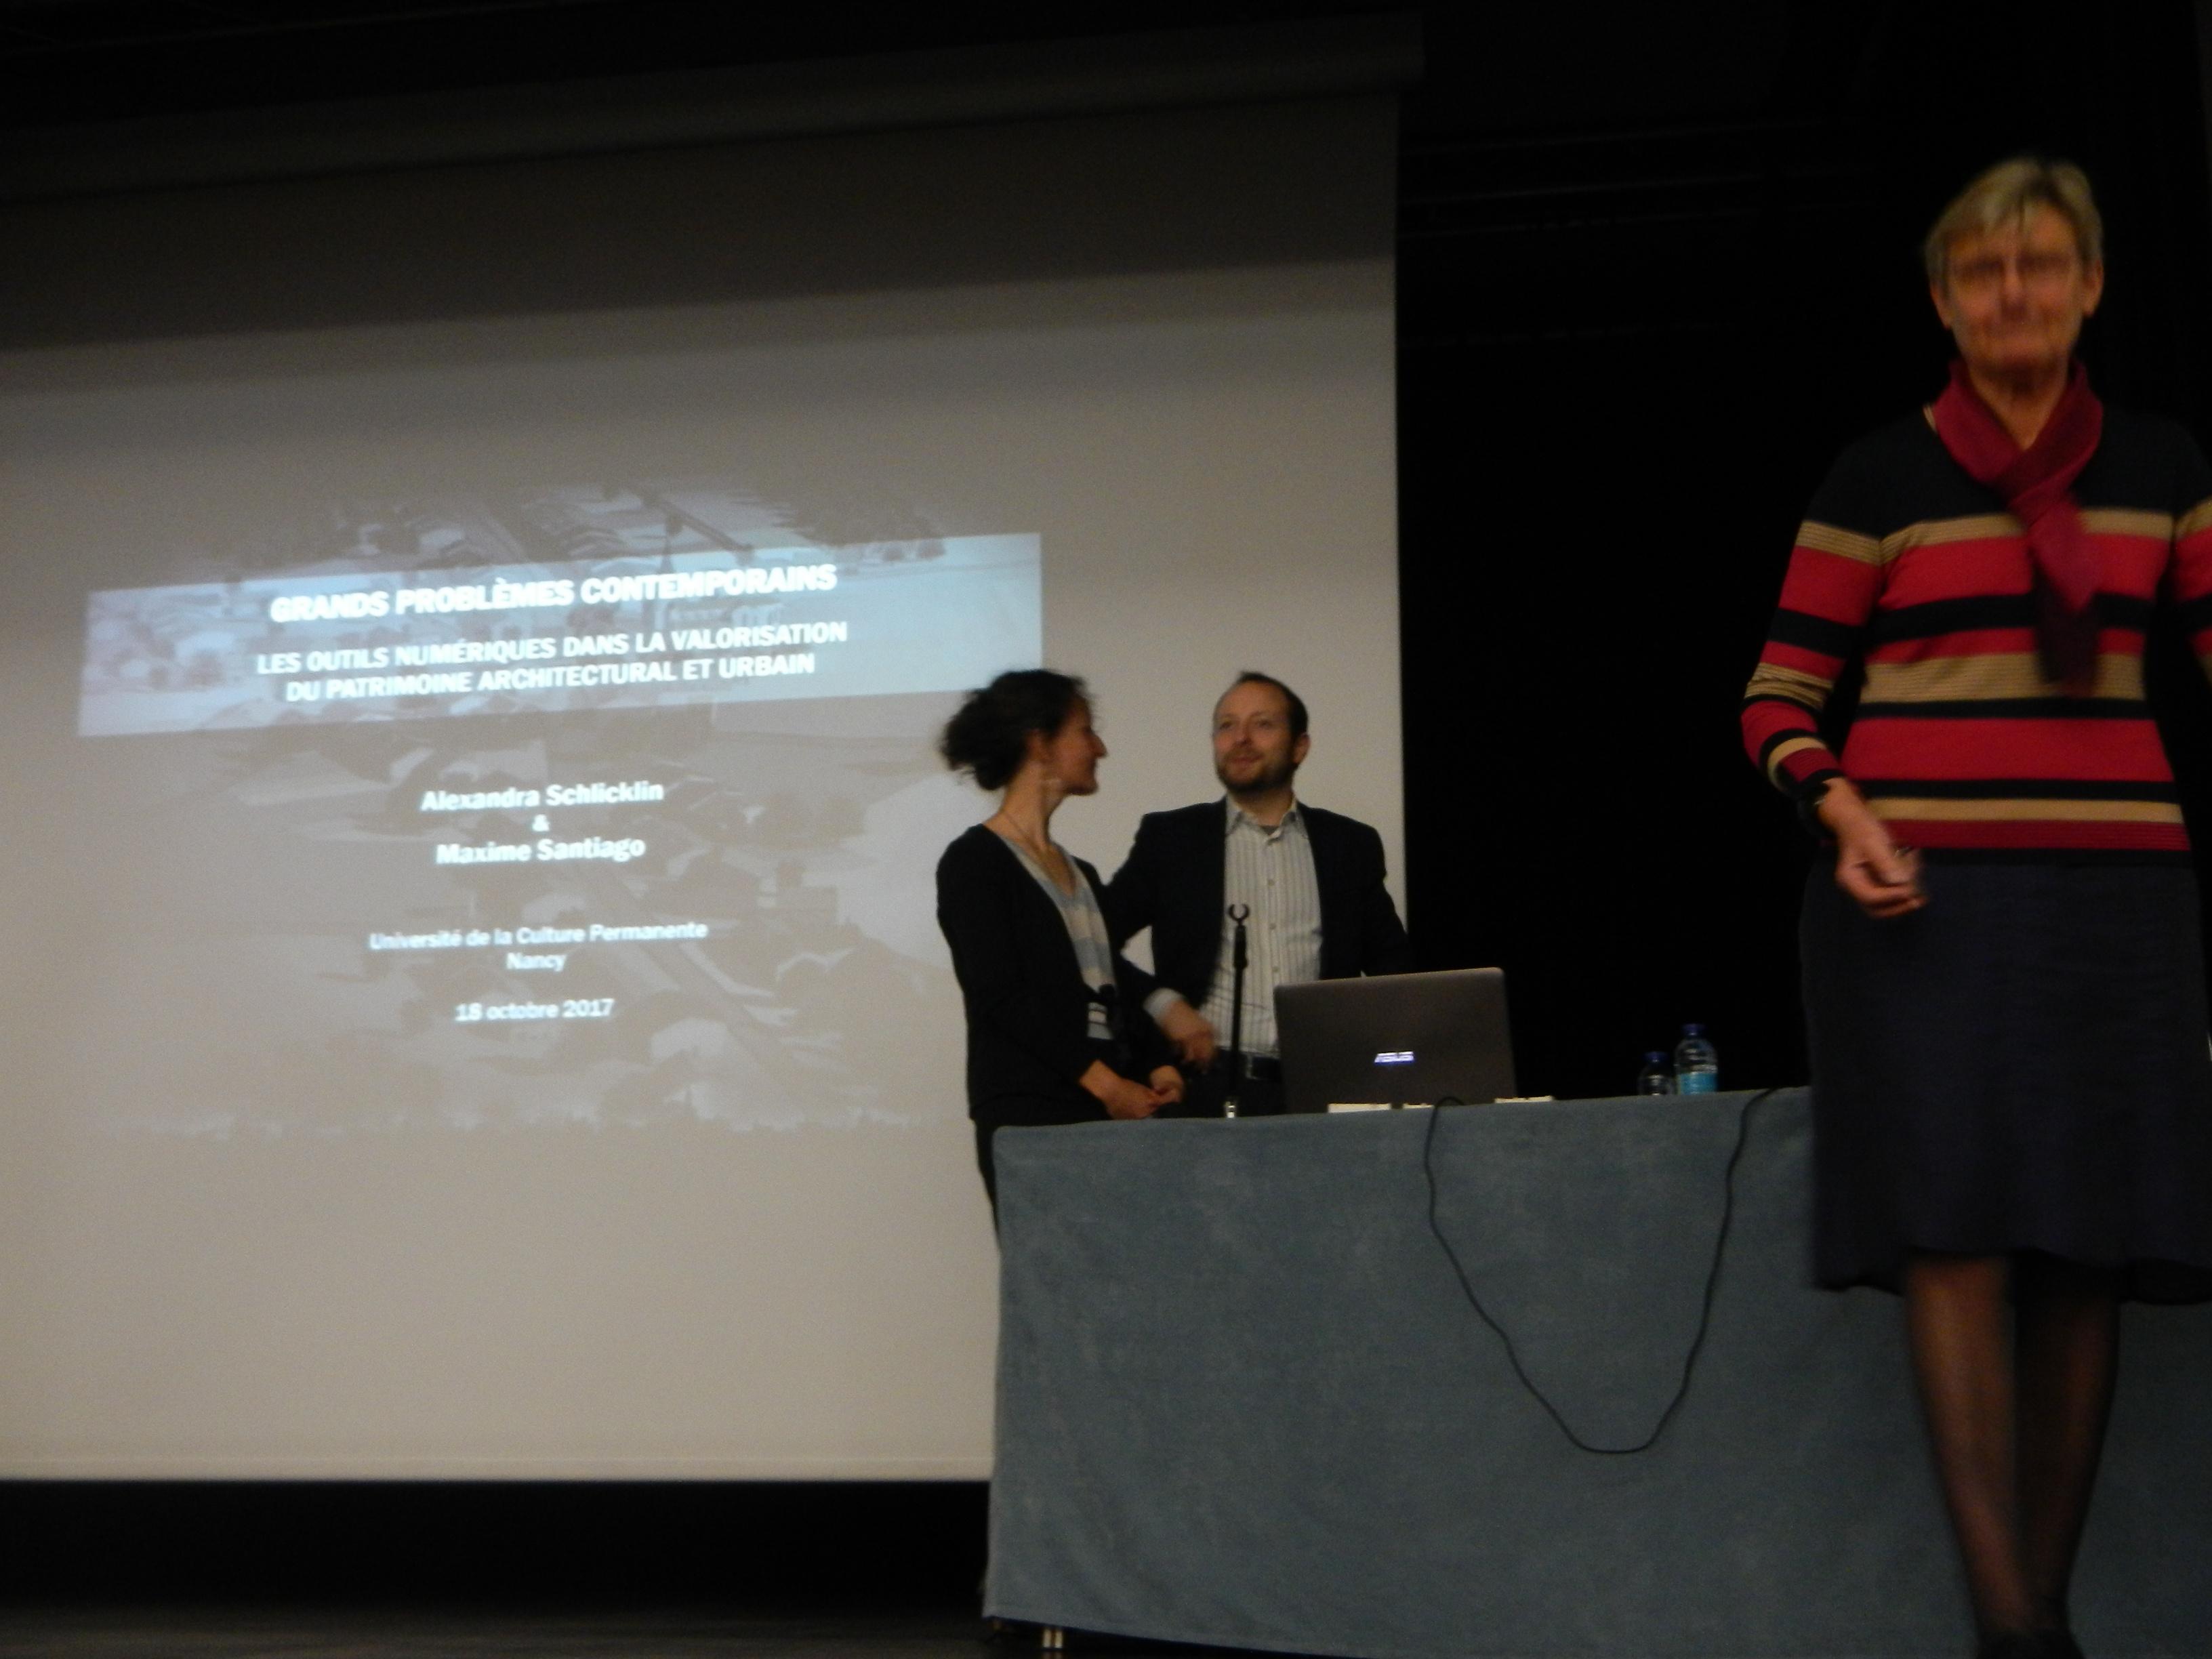 conference alexandra schicklin 02